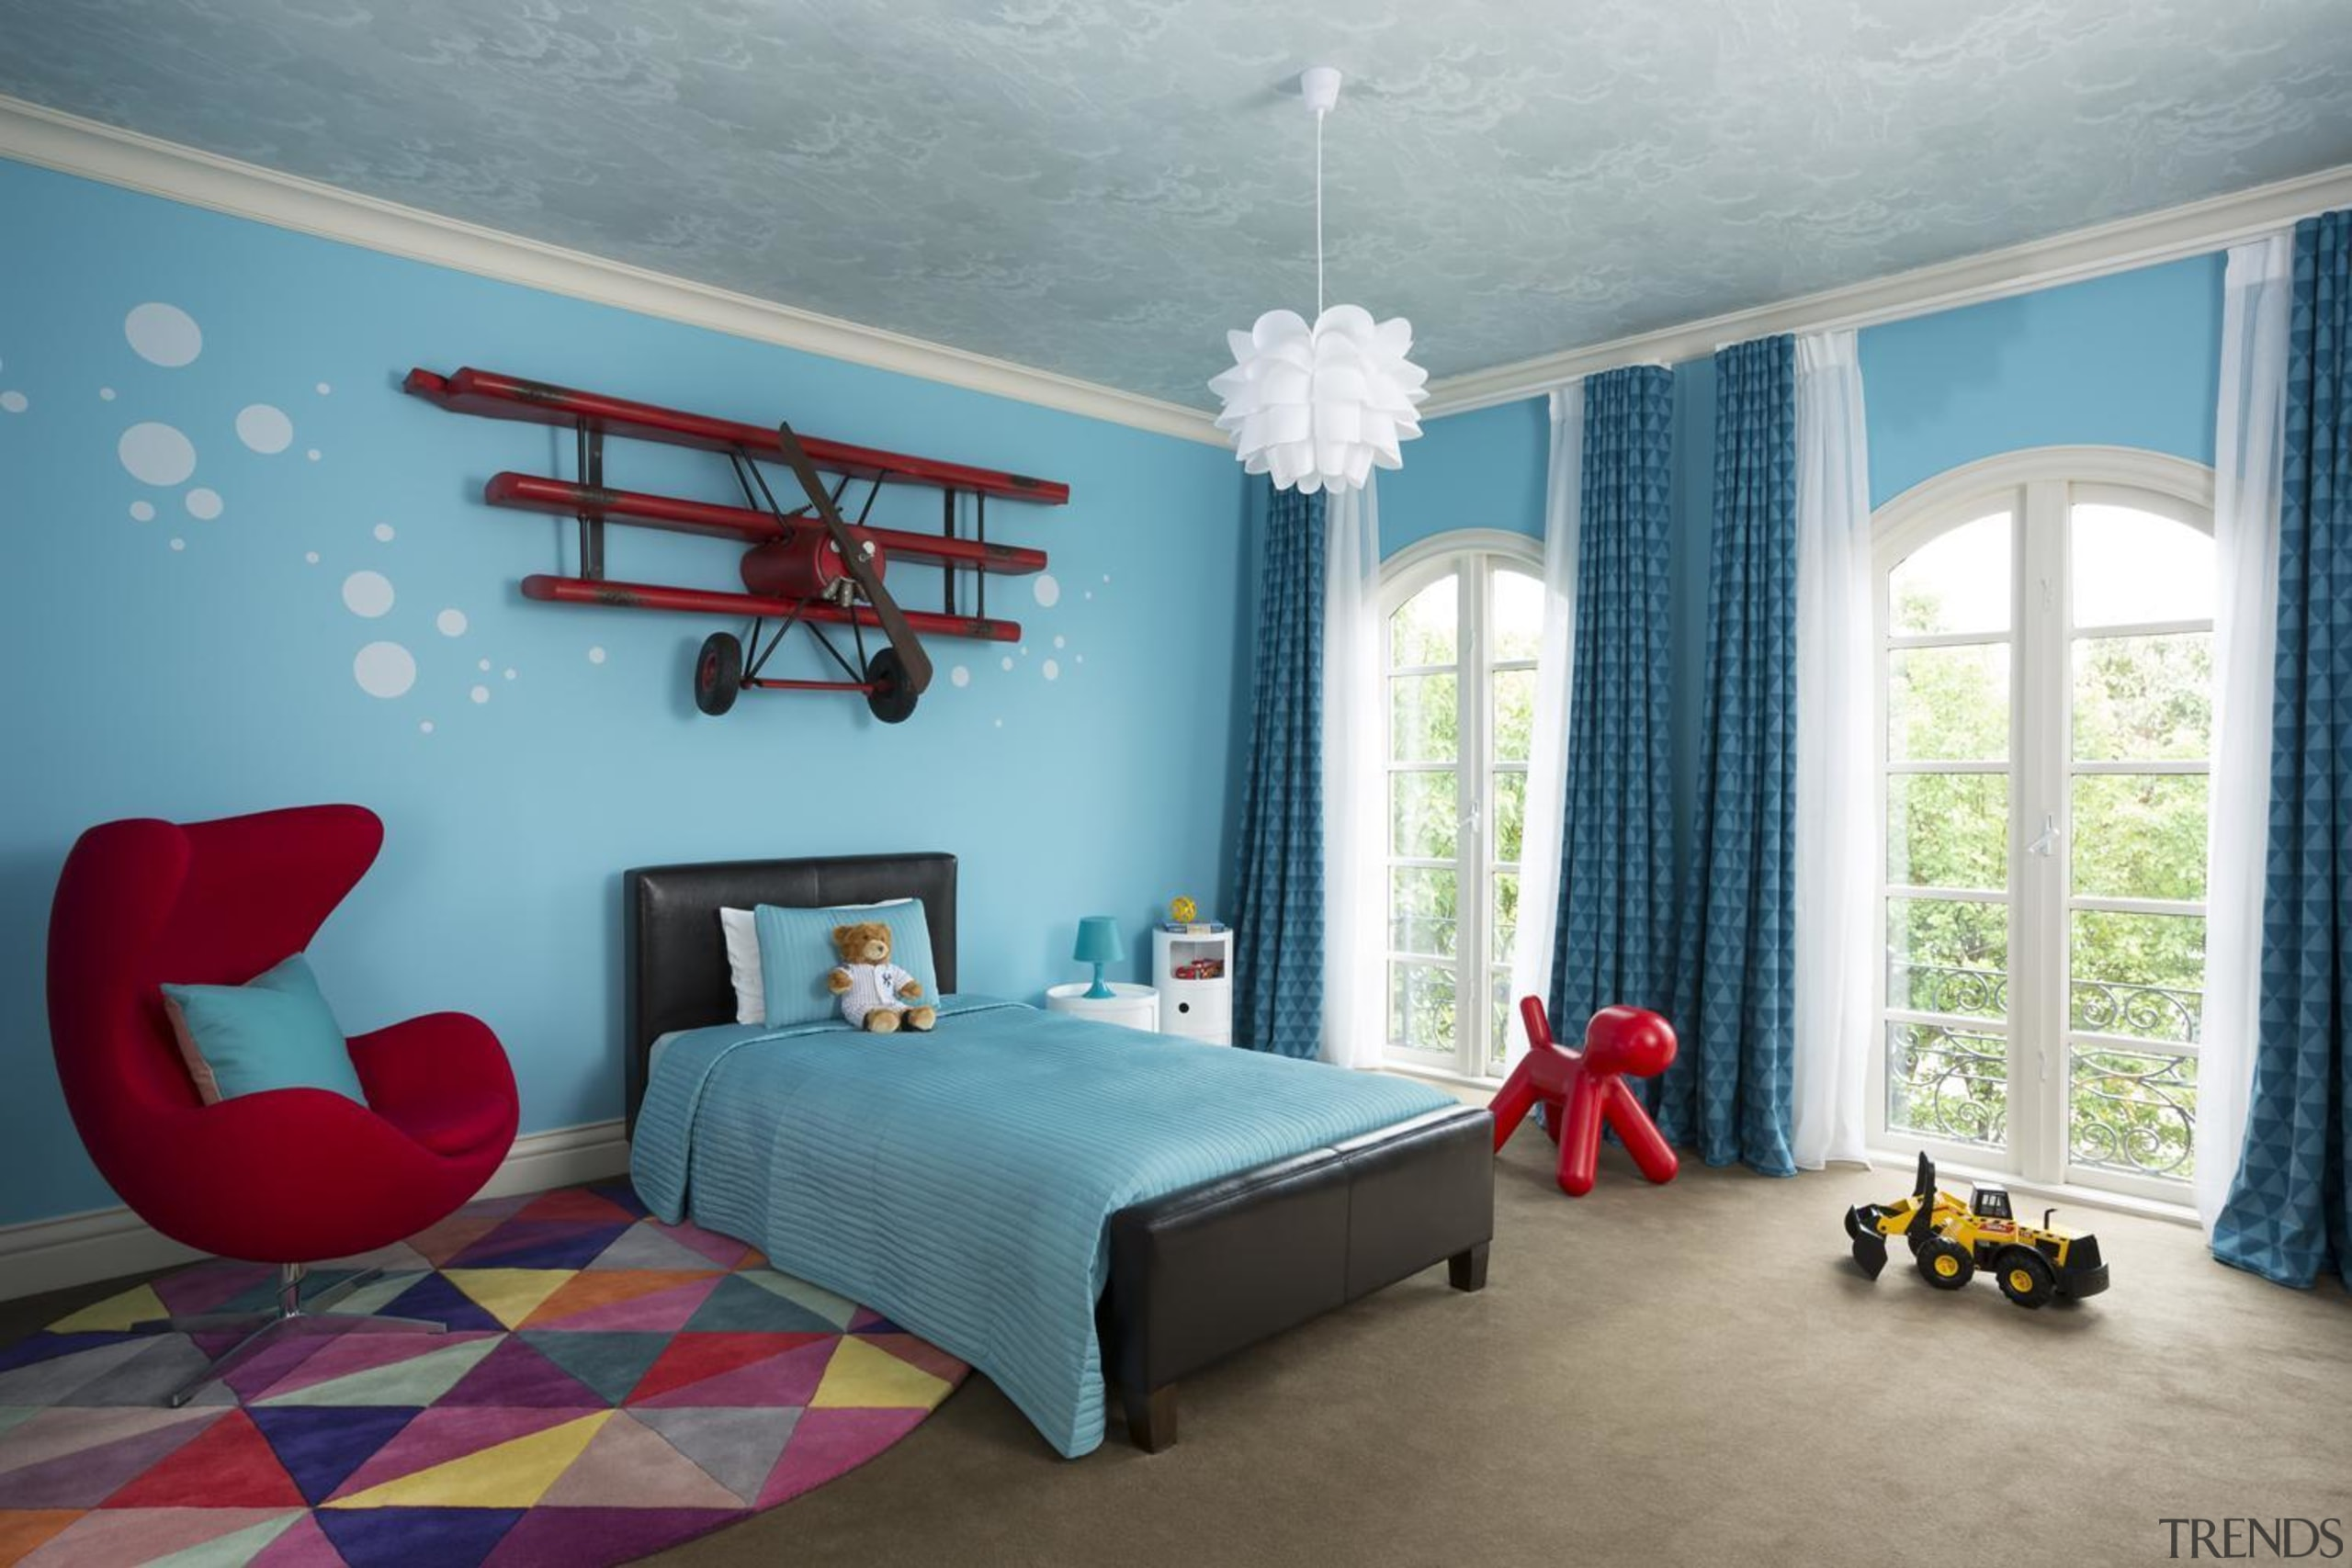 Kids Bedroom - bedding | bedroom | blue bedding, bedroom, blue, ceiling, home, interior design, living room, real estate, room, textile, wall, window, gray, teal